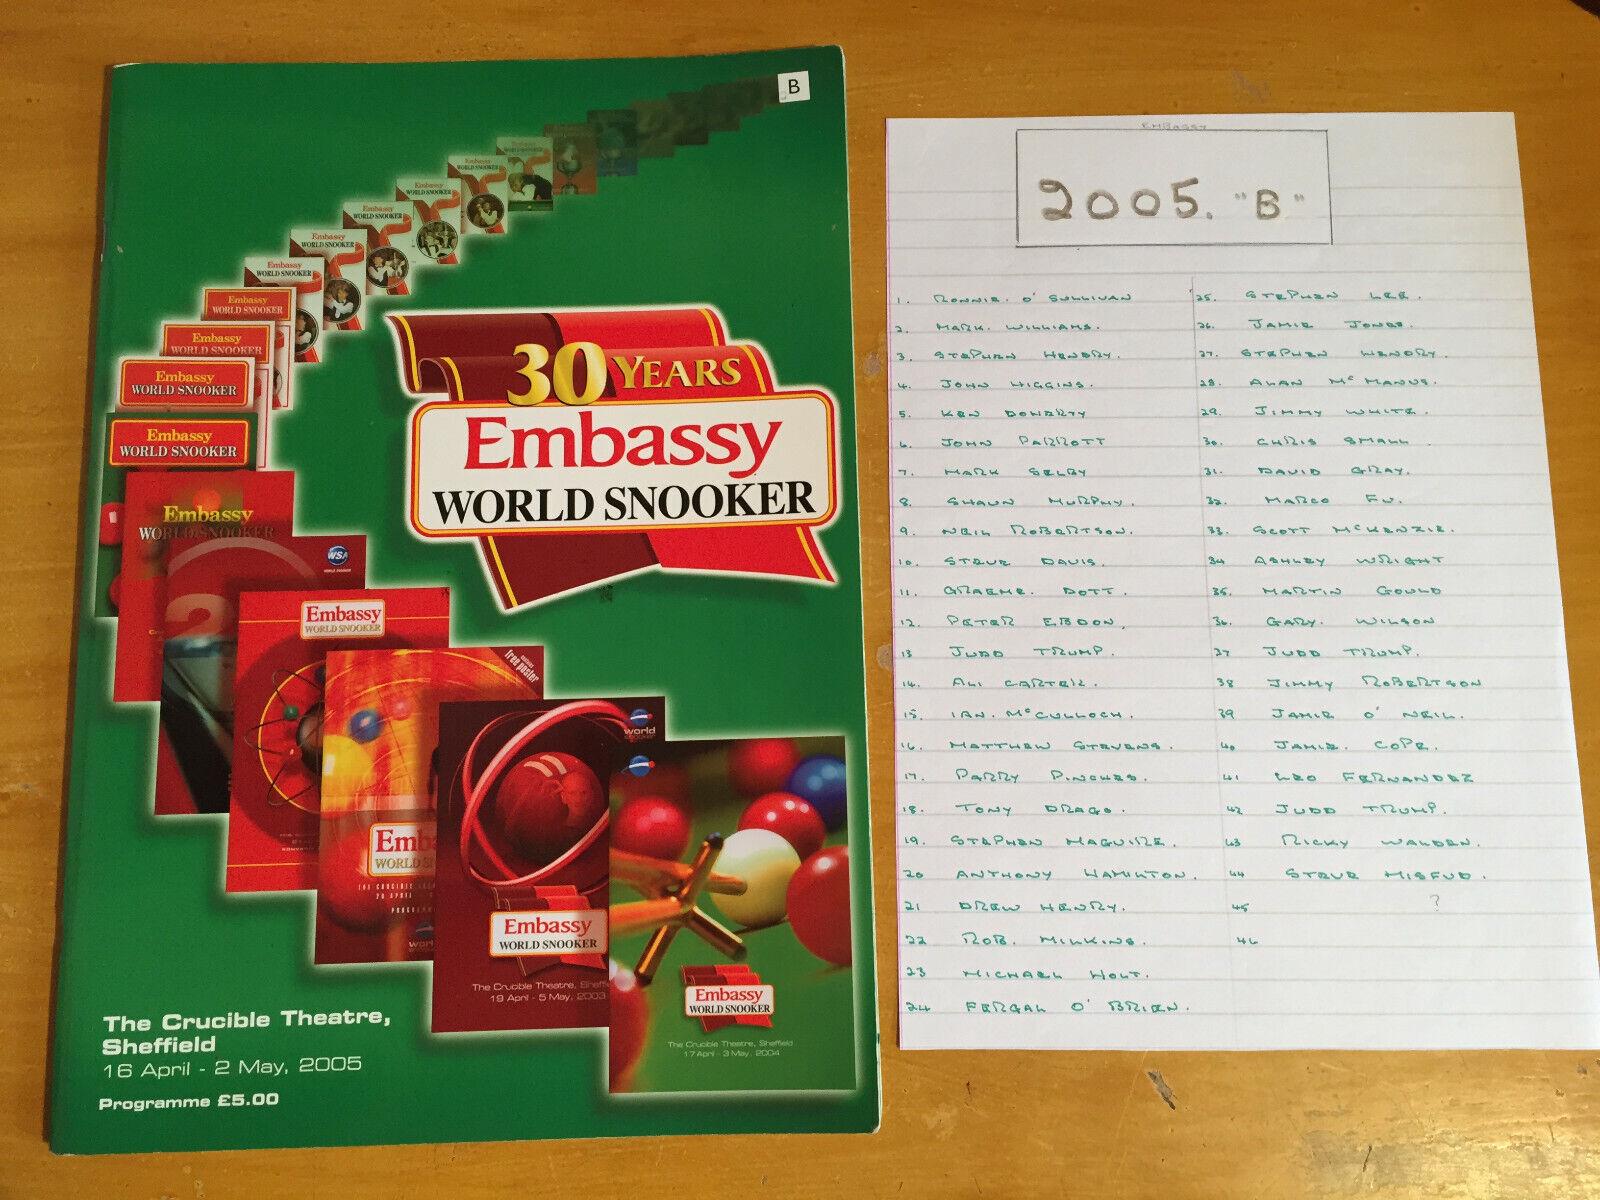 2005 Signed x 45 Embassy World Professional Snooker Championship Programme vgc